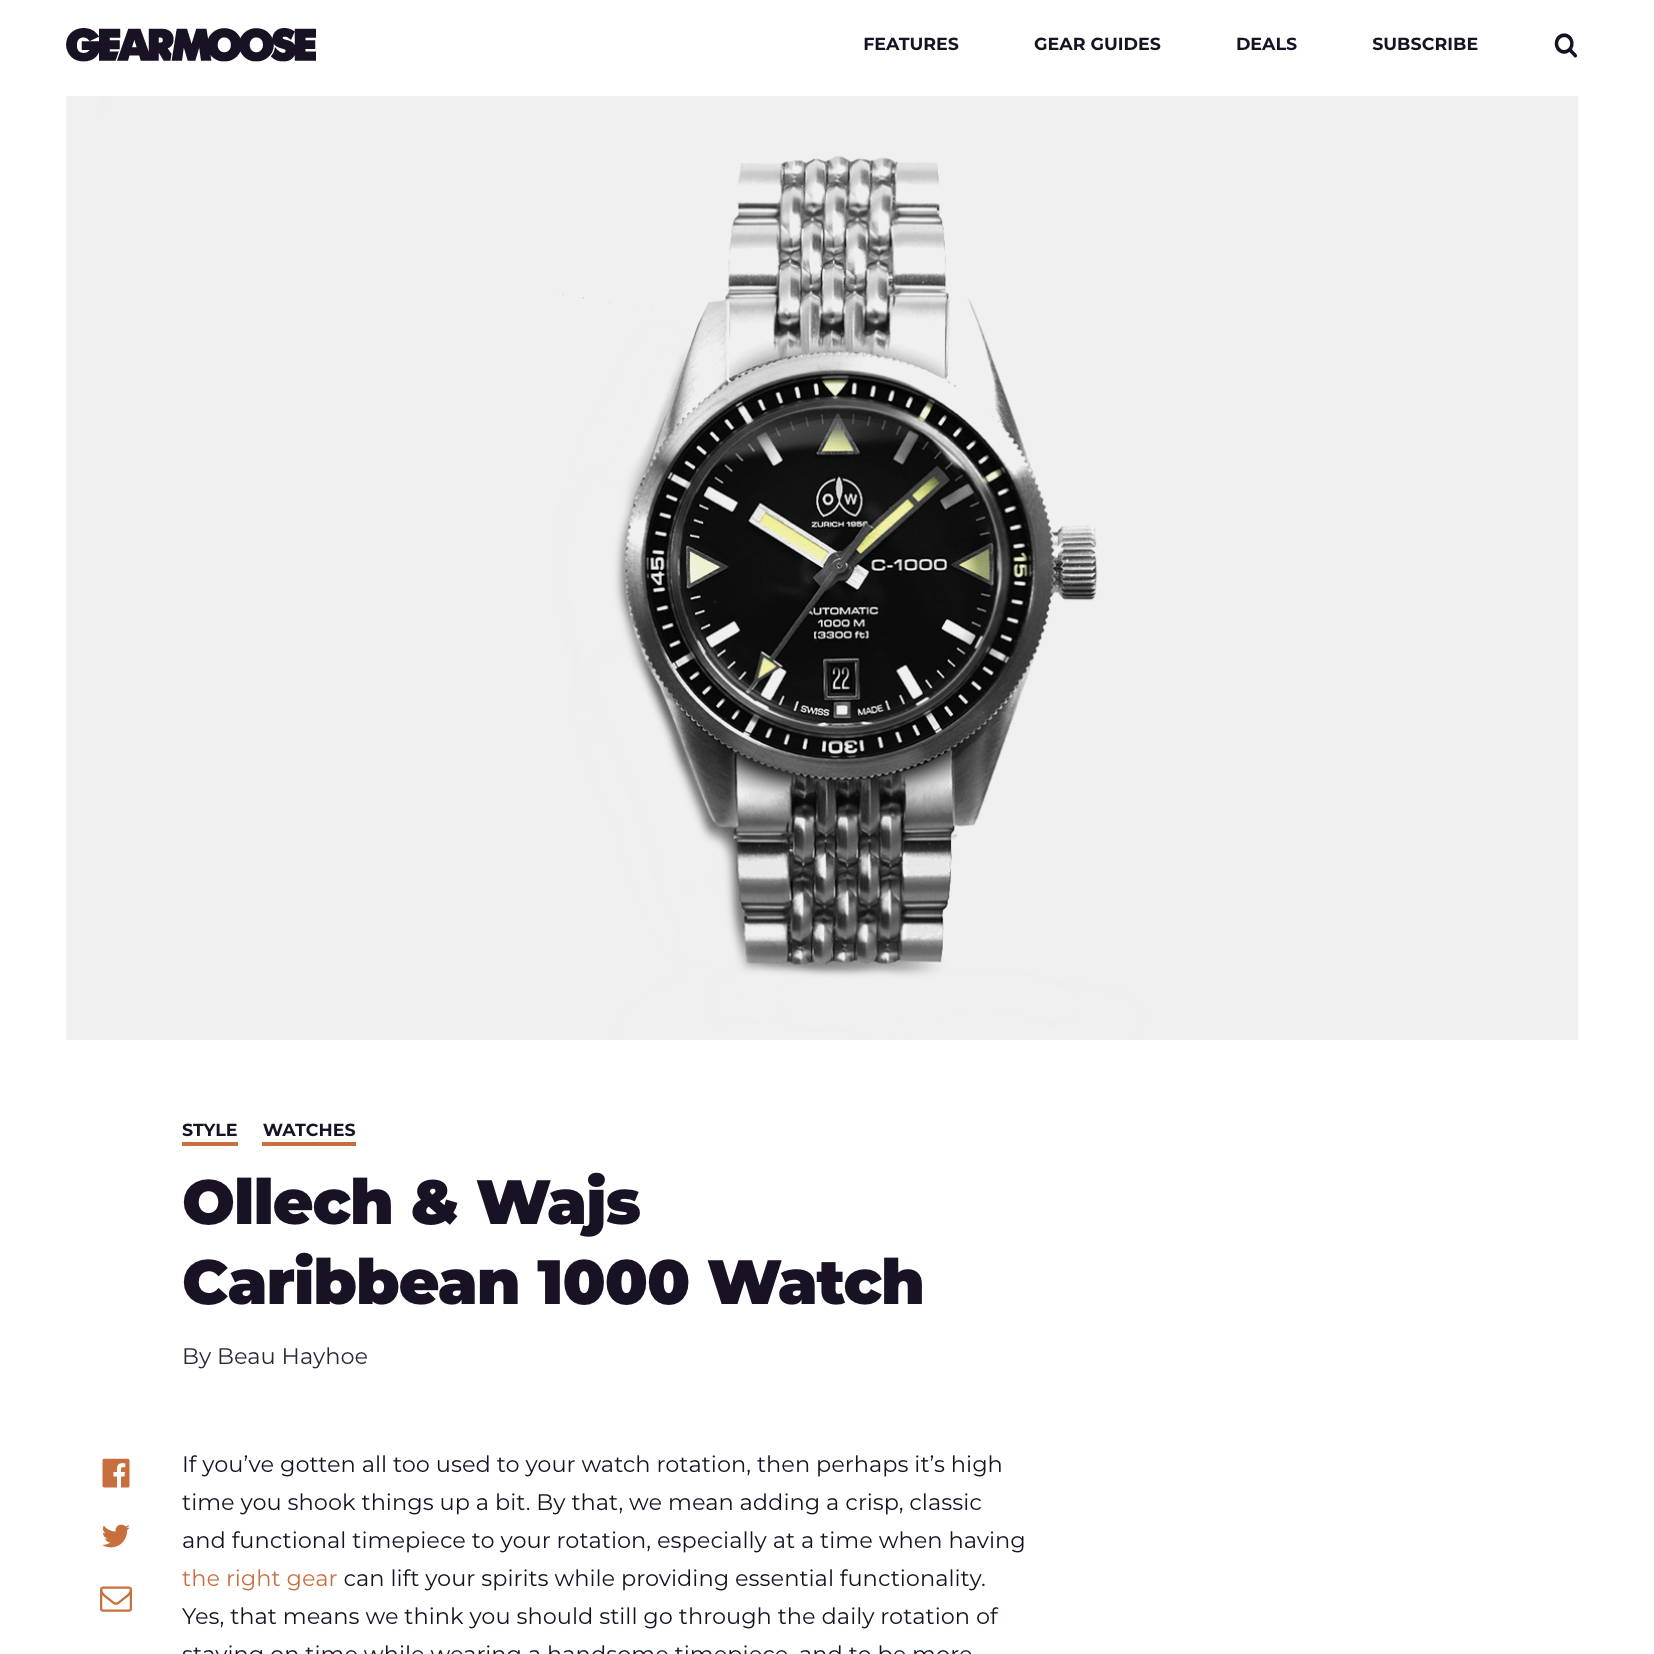 Gear mooose OLLECH & WAJS CARIBBEAN 1000 WATCH